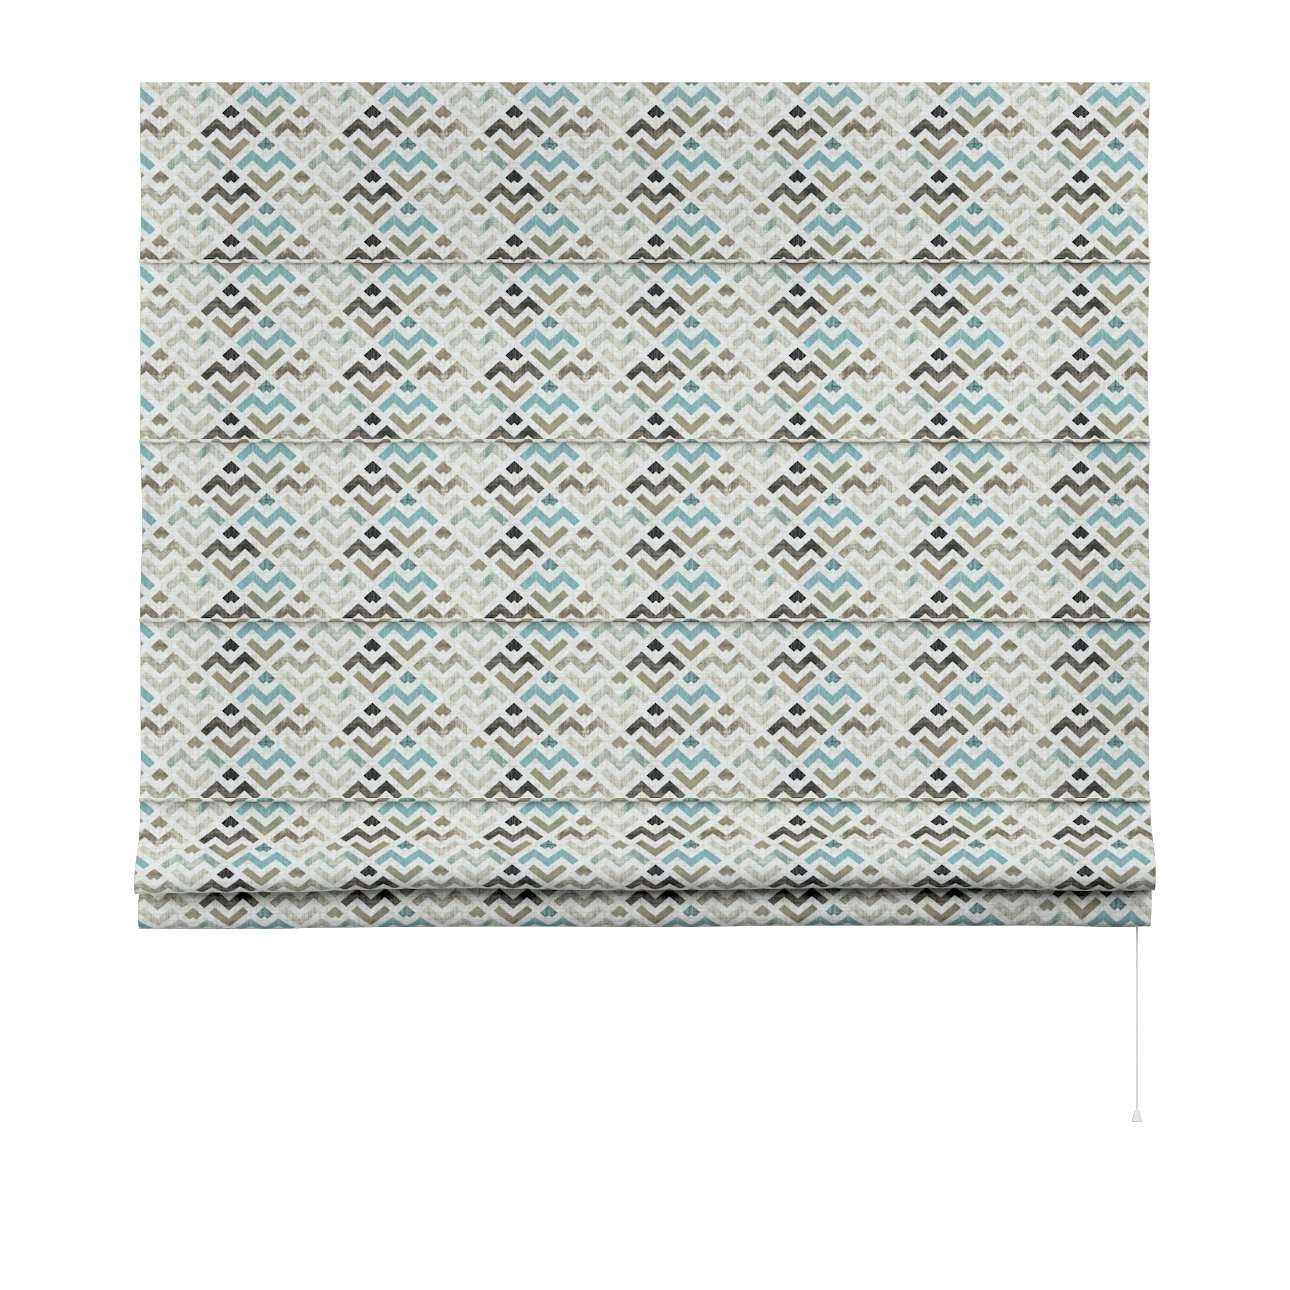 Rímska roleta Capri V kolekcii Modern, tkanina: 141-93